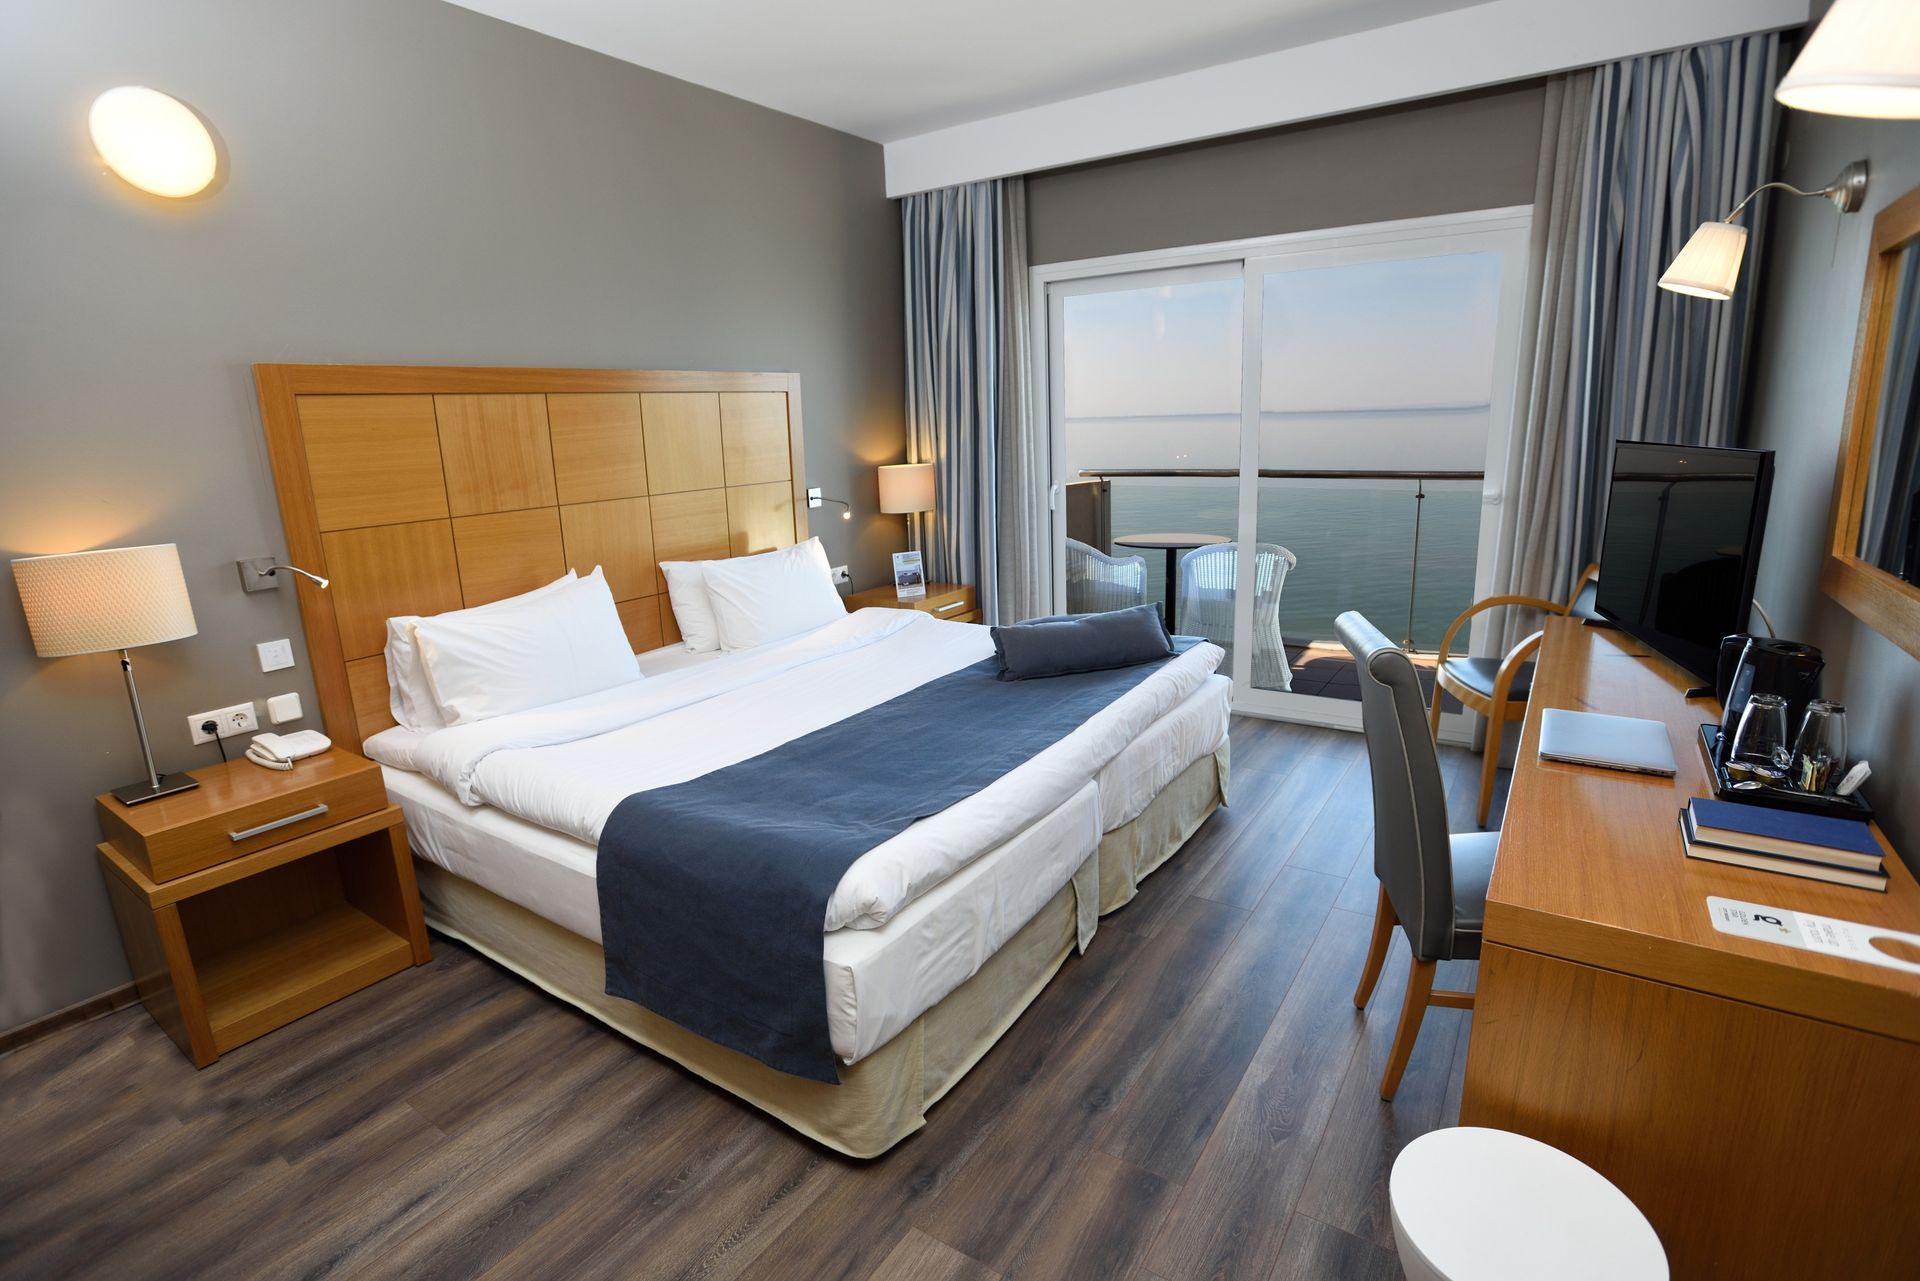 4* Golden Star City Resort - Θεσσαλονίκη ✦ -42% ✦ 4